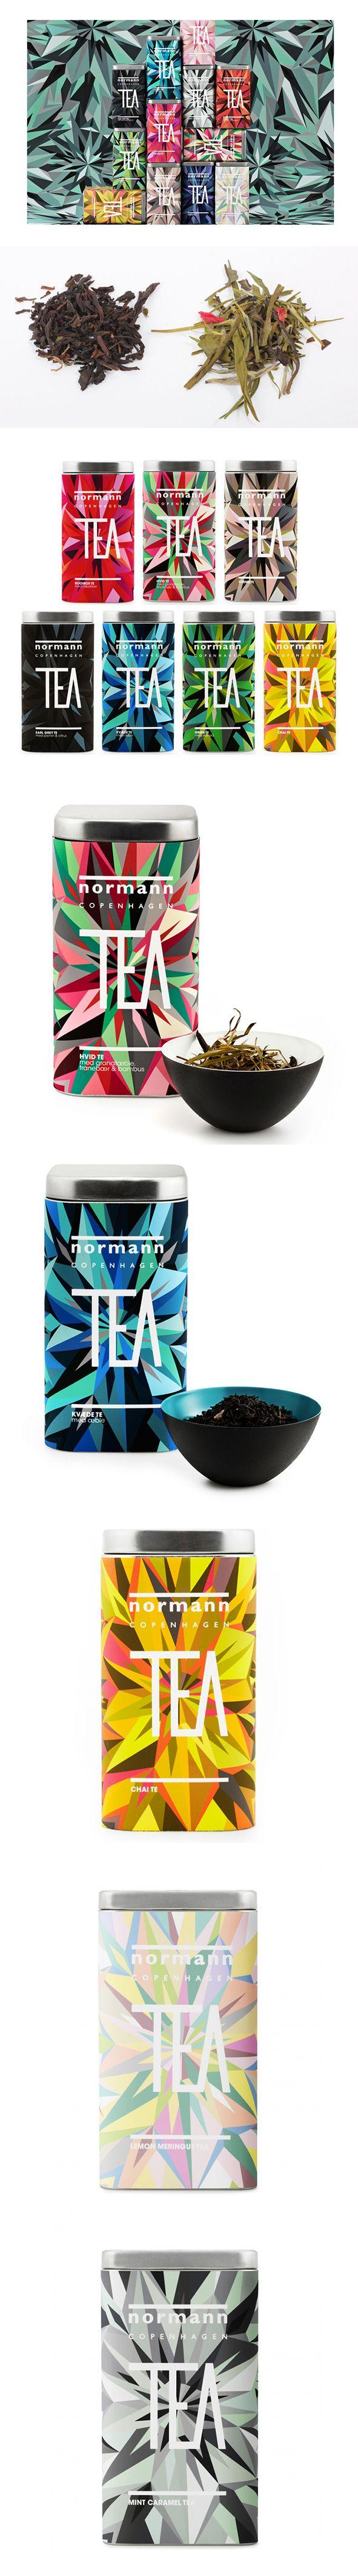 Great use of geometric design to represent tea leaves. Normann Copenhagen Tea #packaging #design